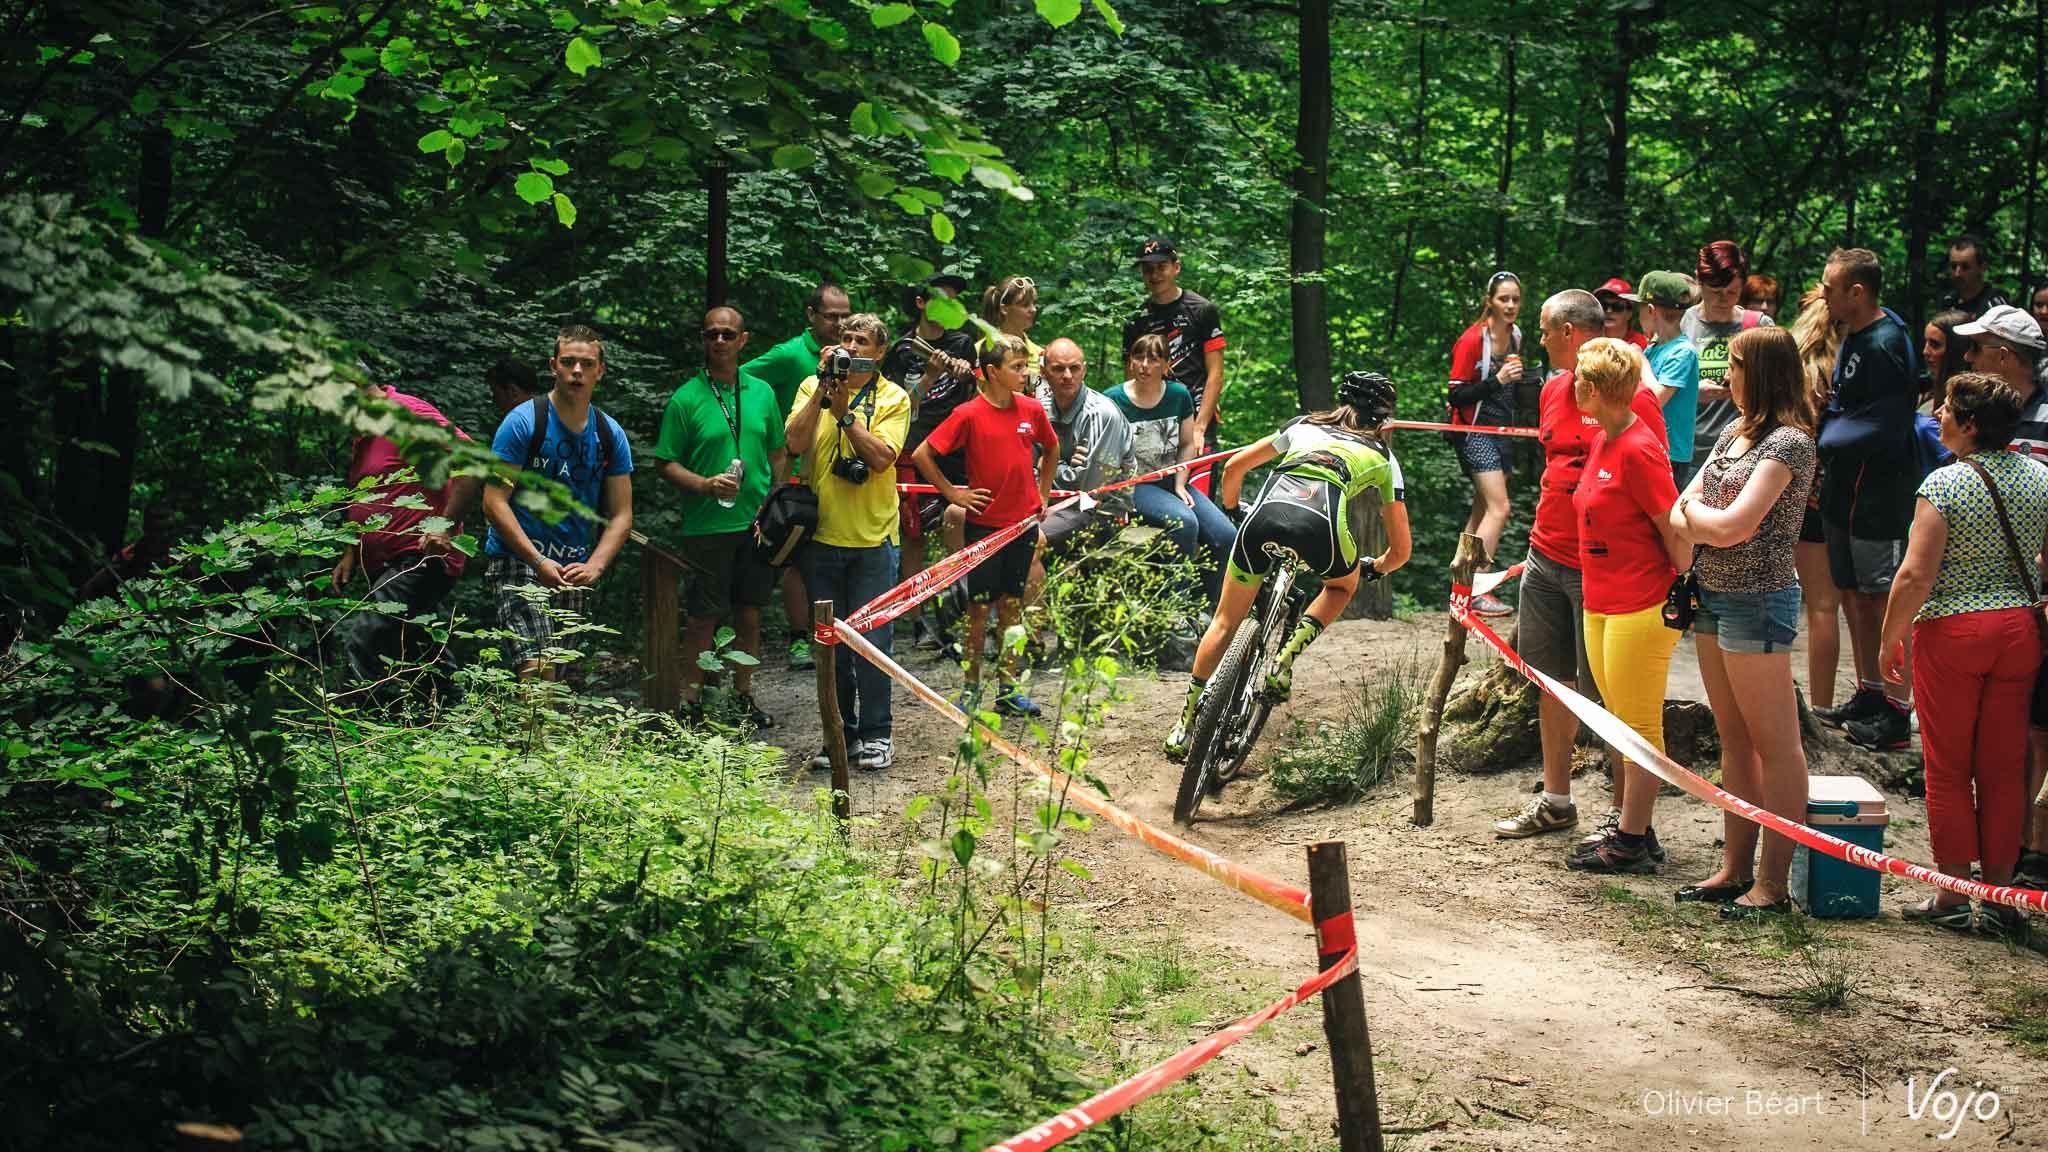 Championnat_Belgique_XC_BKXC_Ottignies_2015_Dames_Githa_Michiels_Alice_Pirard_Alicia_Franck_Copyright_OBeart_VojoMag-1